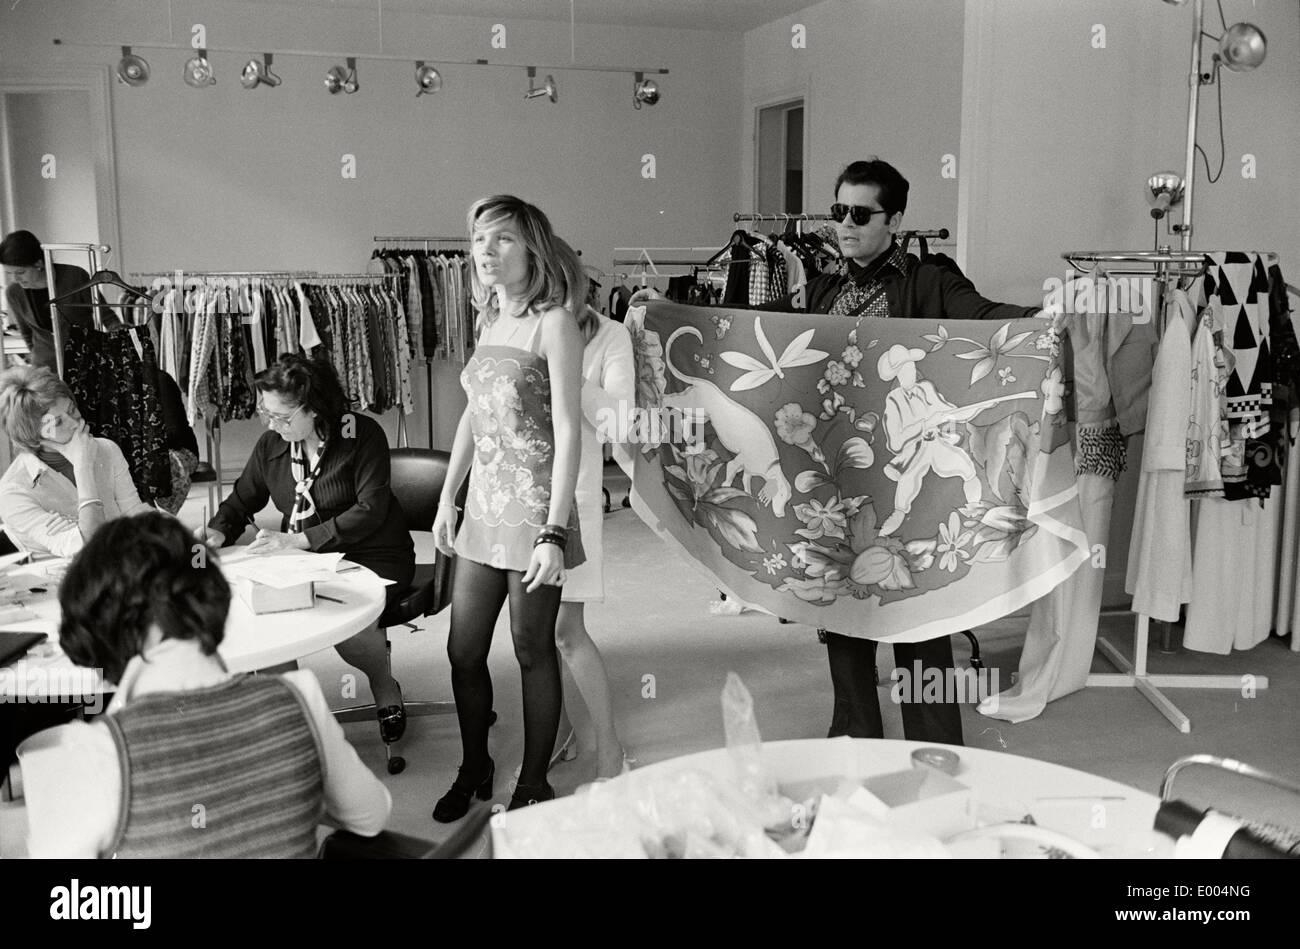 1972 fashion model stockfotos 1972 fashion model bilder alamy - Linge de maison karl lagerfeld ...